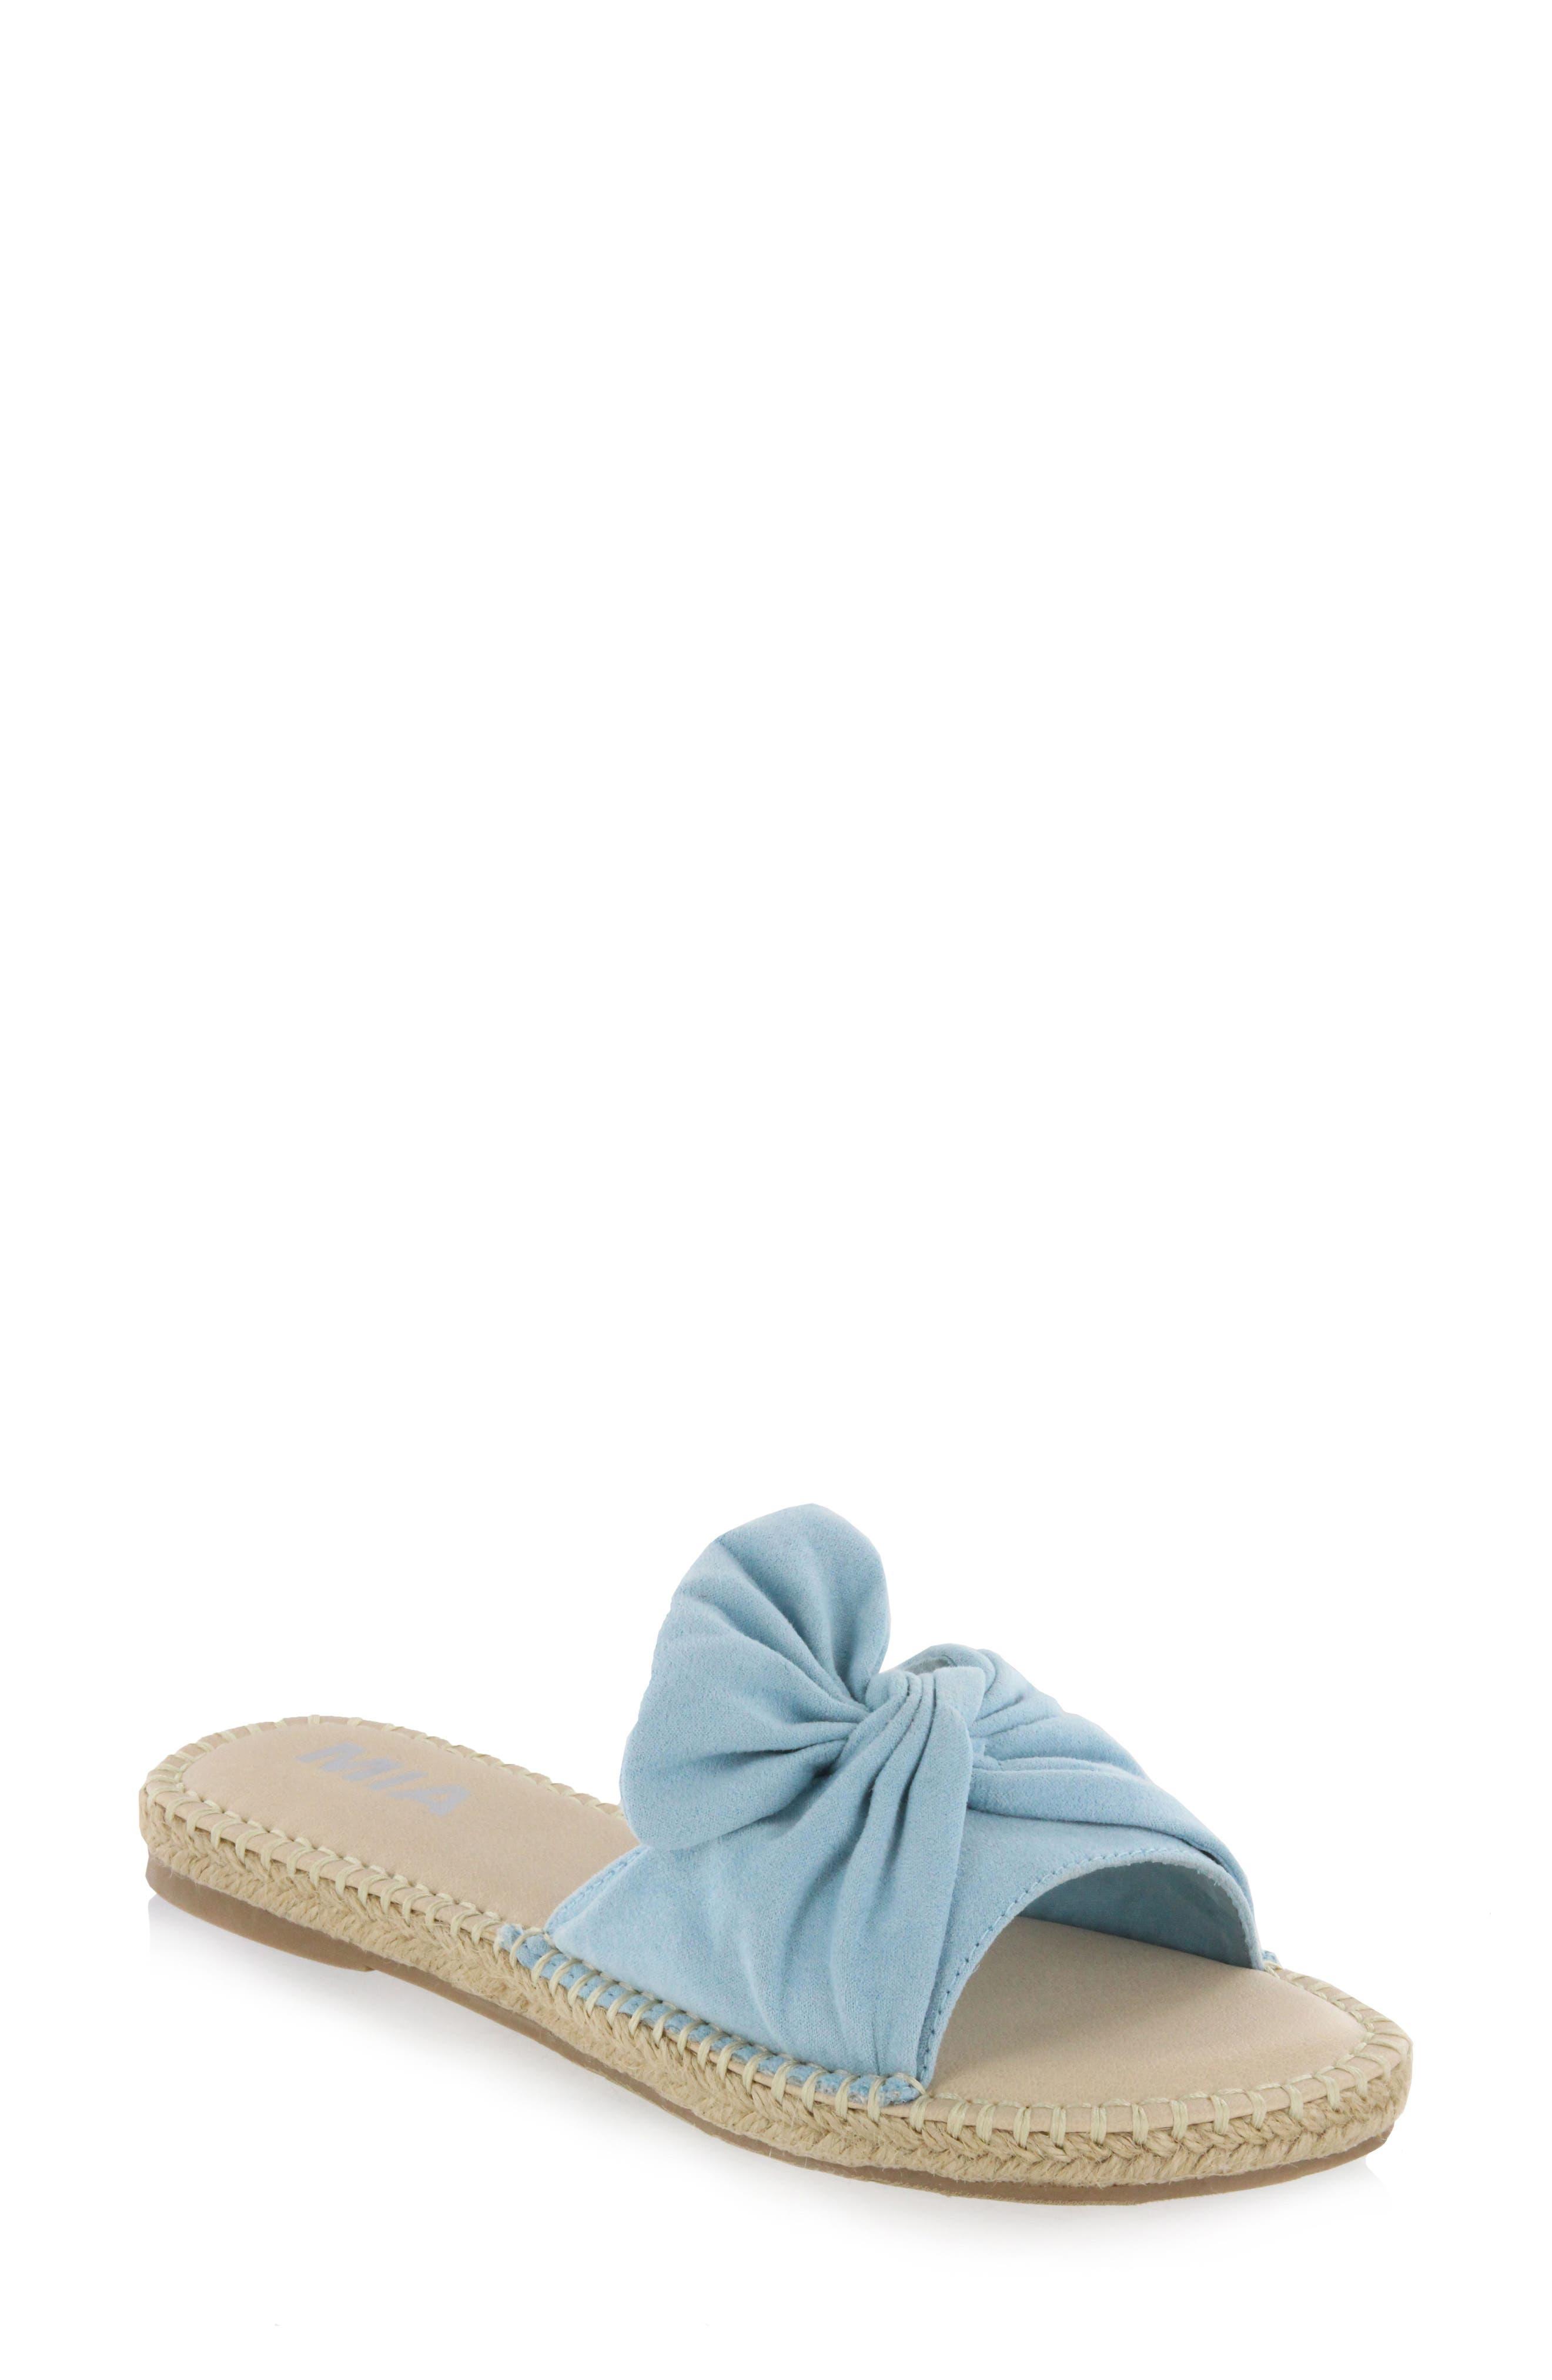 Main Image - MIA Kensi Knotted Slide Sandal (Women)